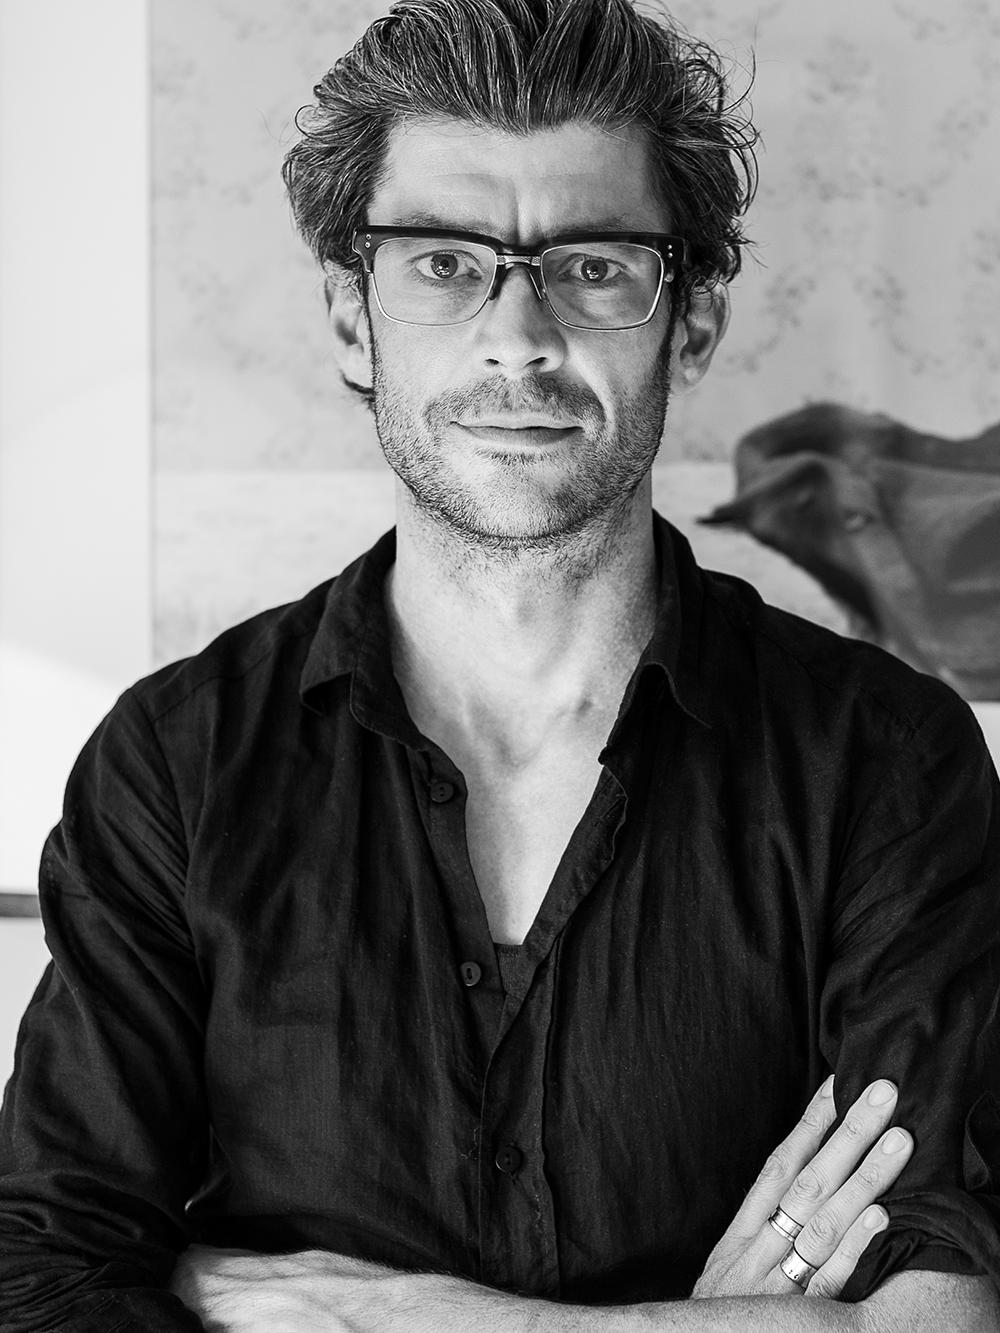 Nicholas Visser